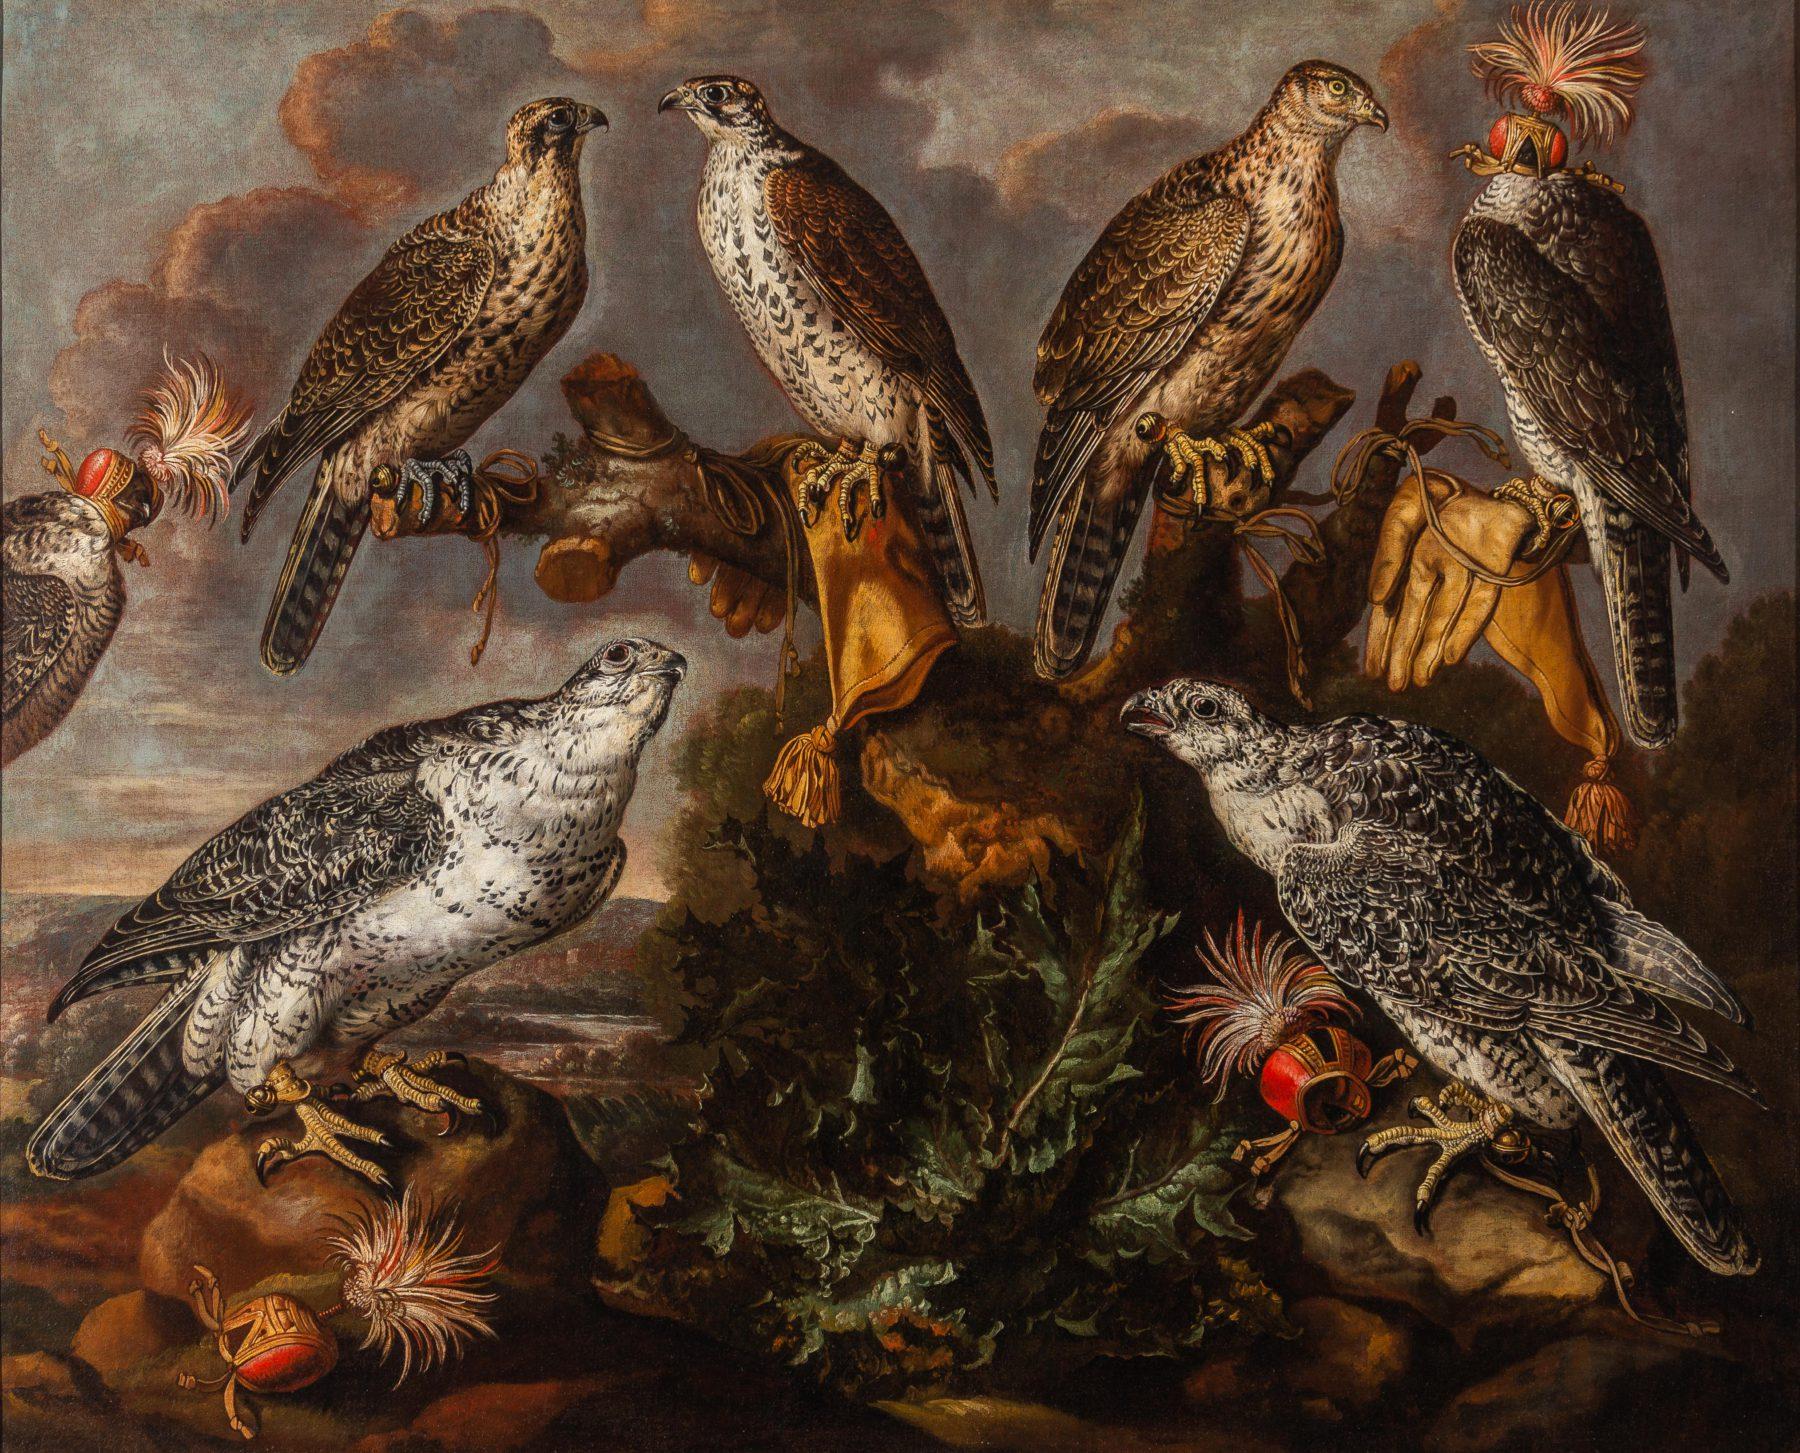 Luyckx falcons